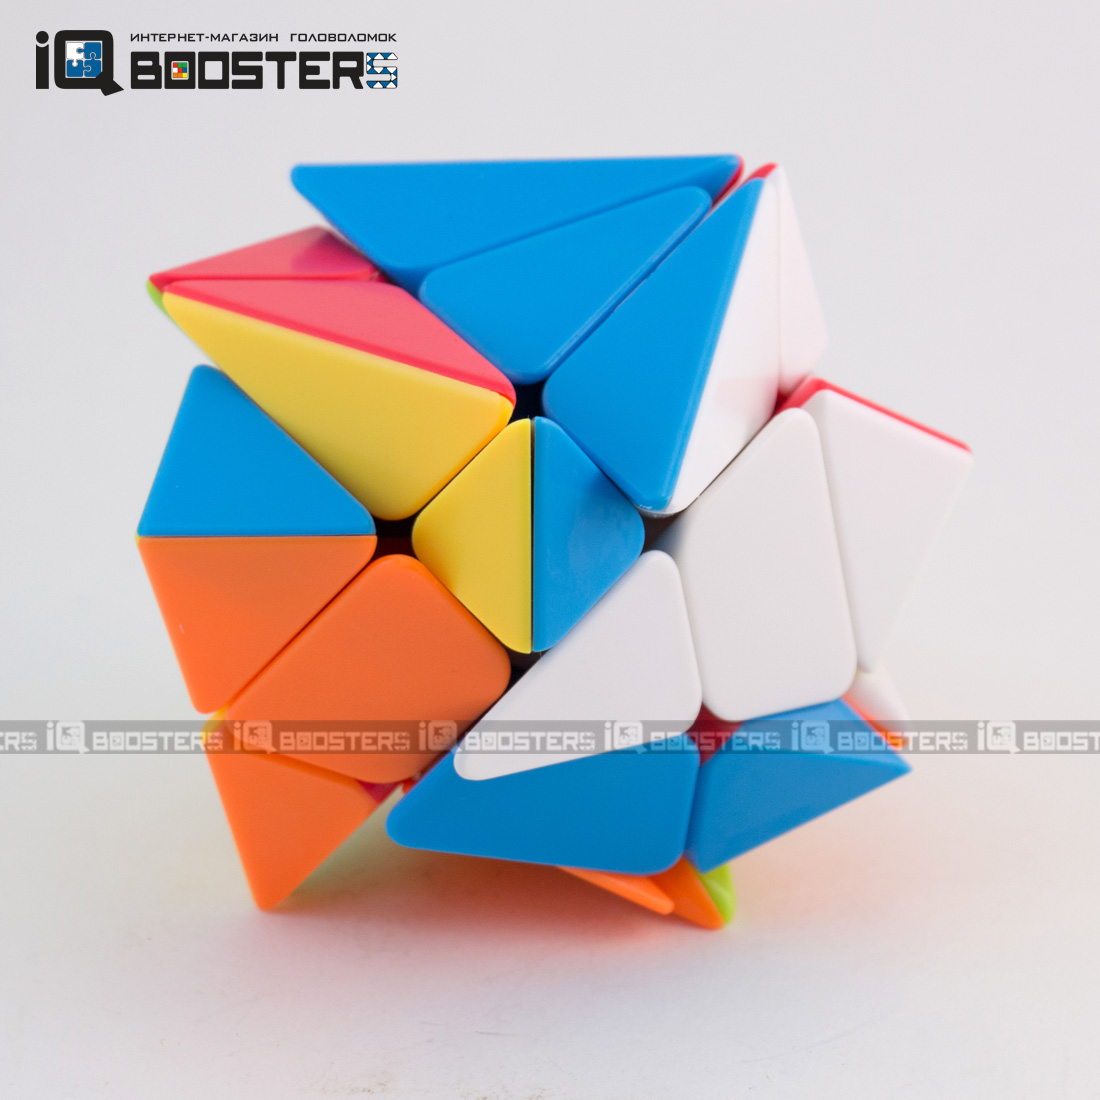 fanxin_axis_cube_3